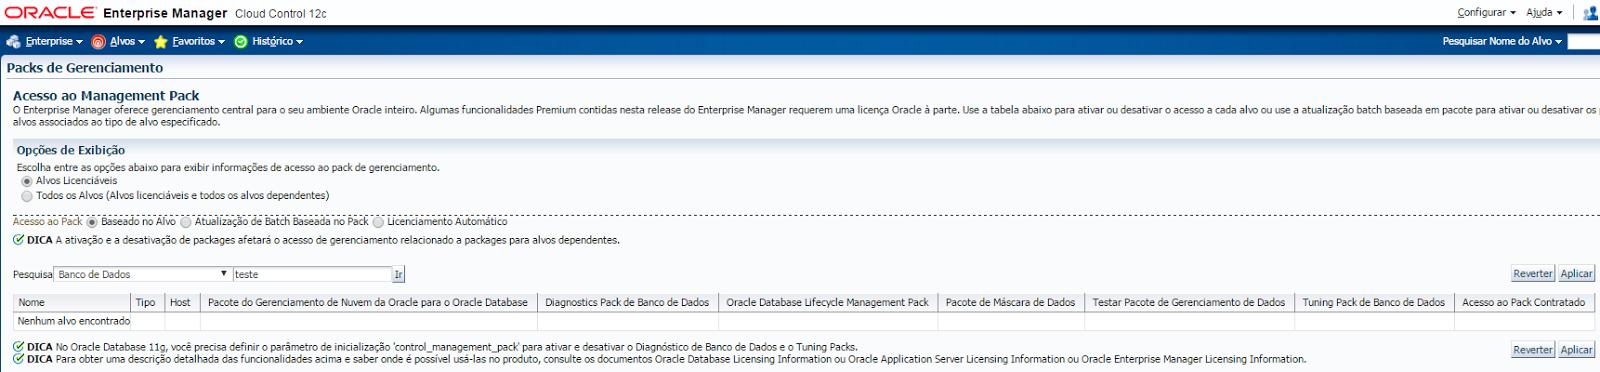 O que é o Oracle Enterprise Manager? Ele é pago ou gratuito?   Blog